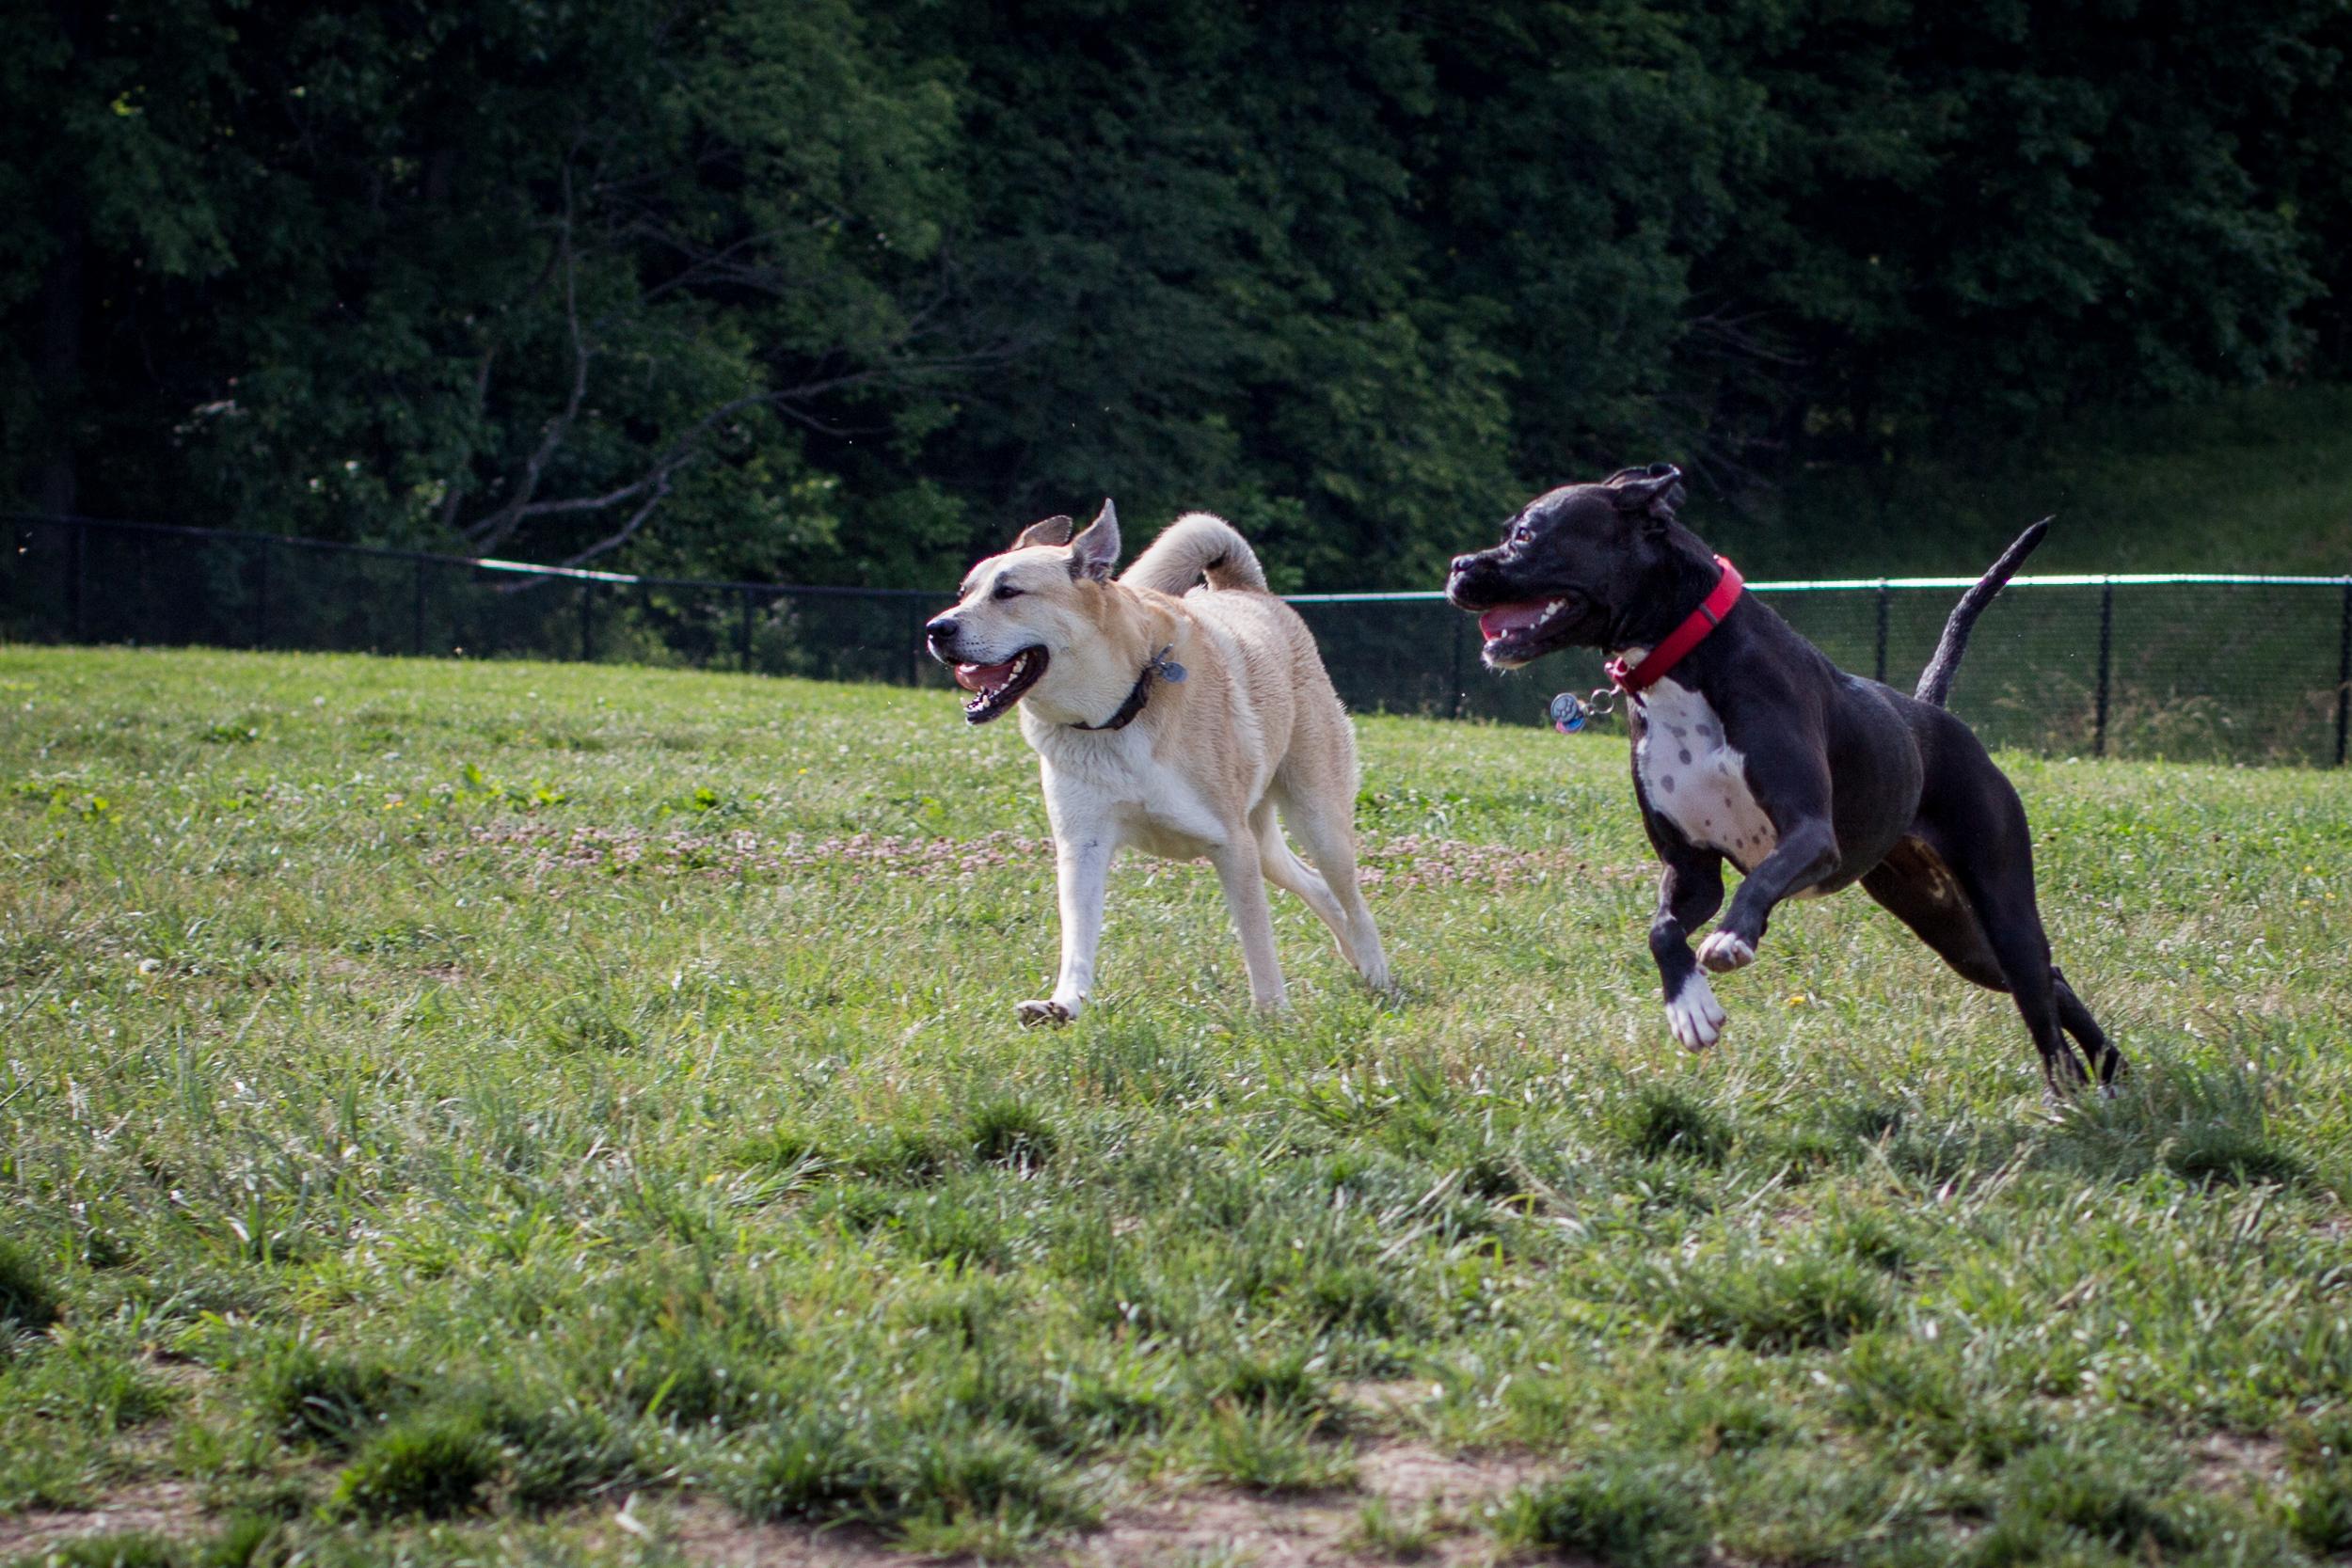 Lacey_dogpark_061817-6.jpg